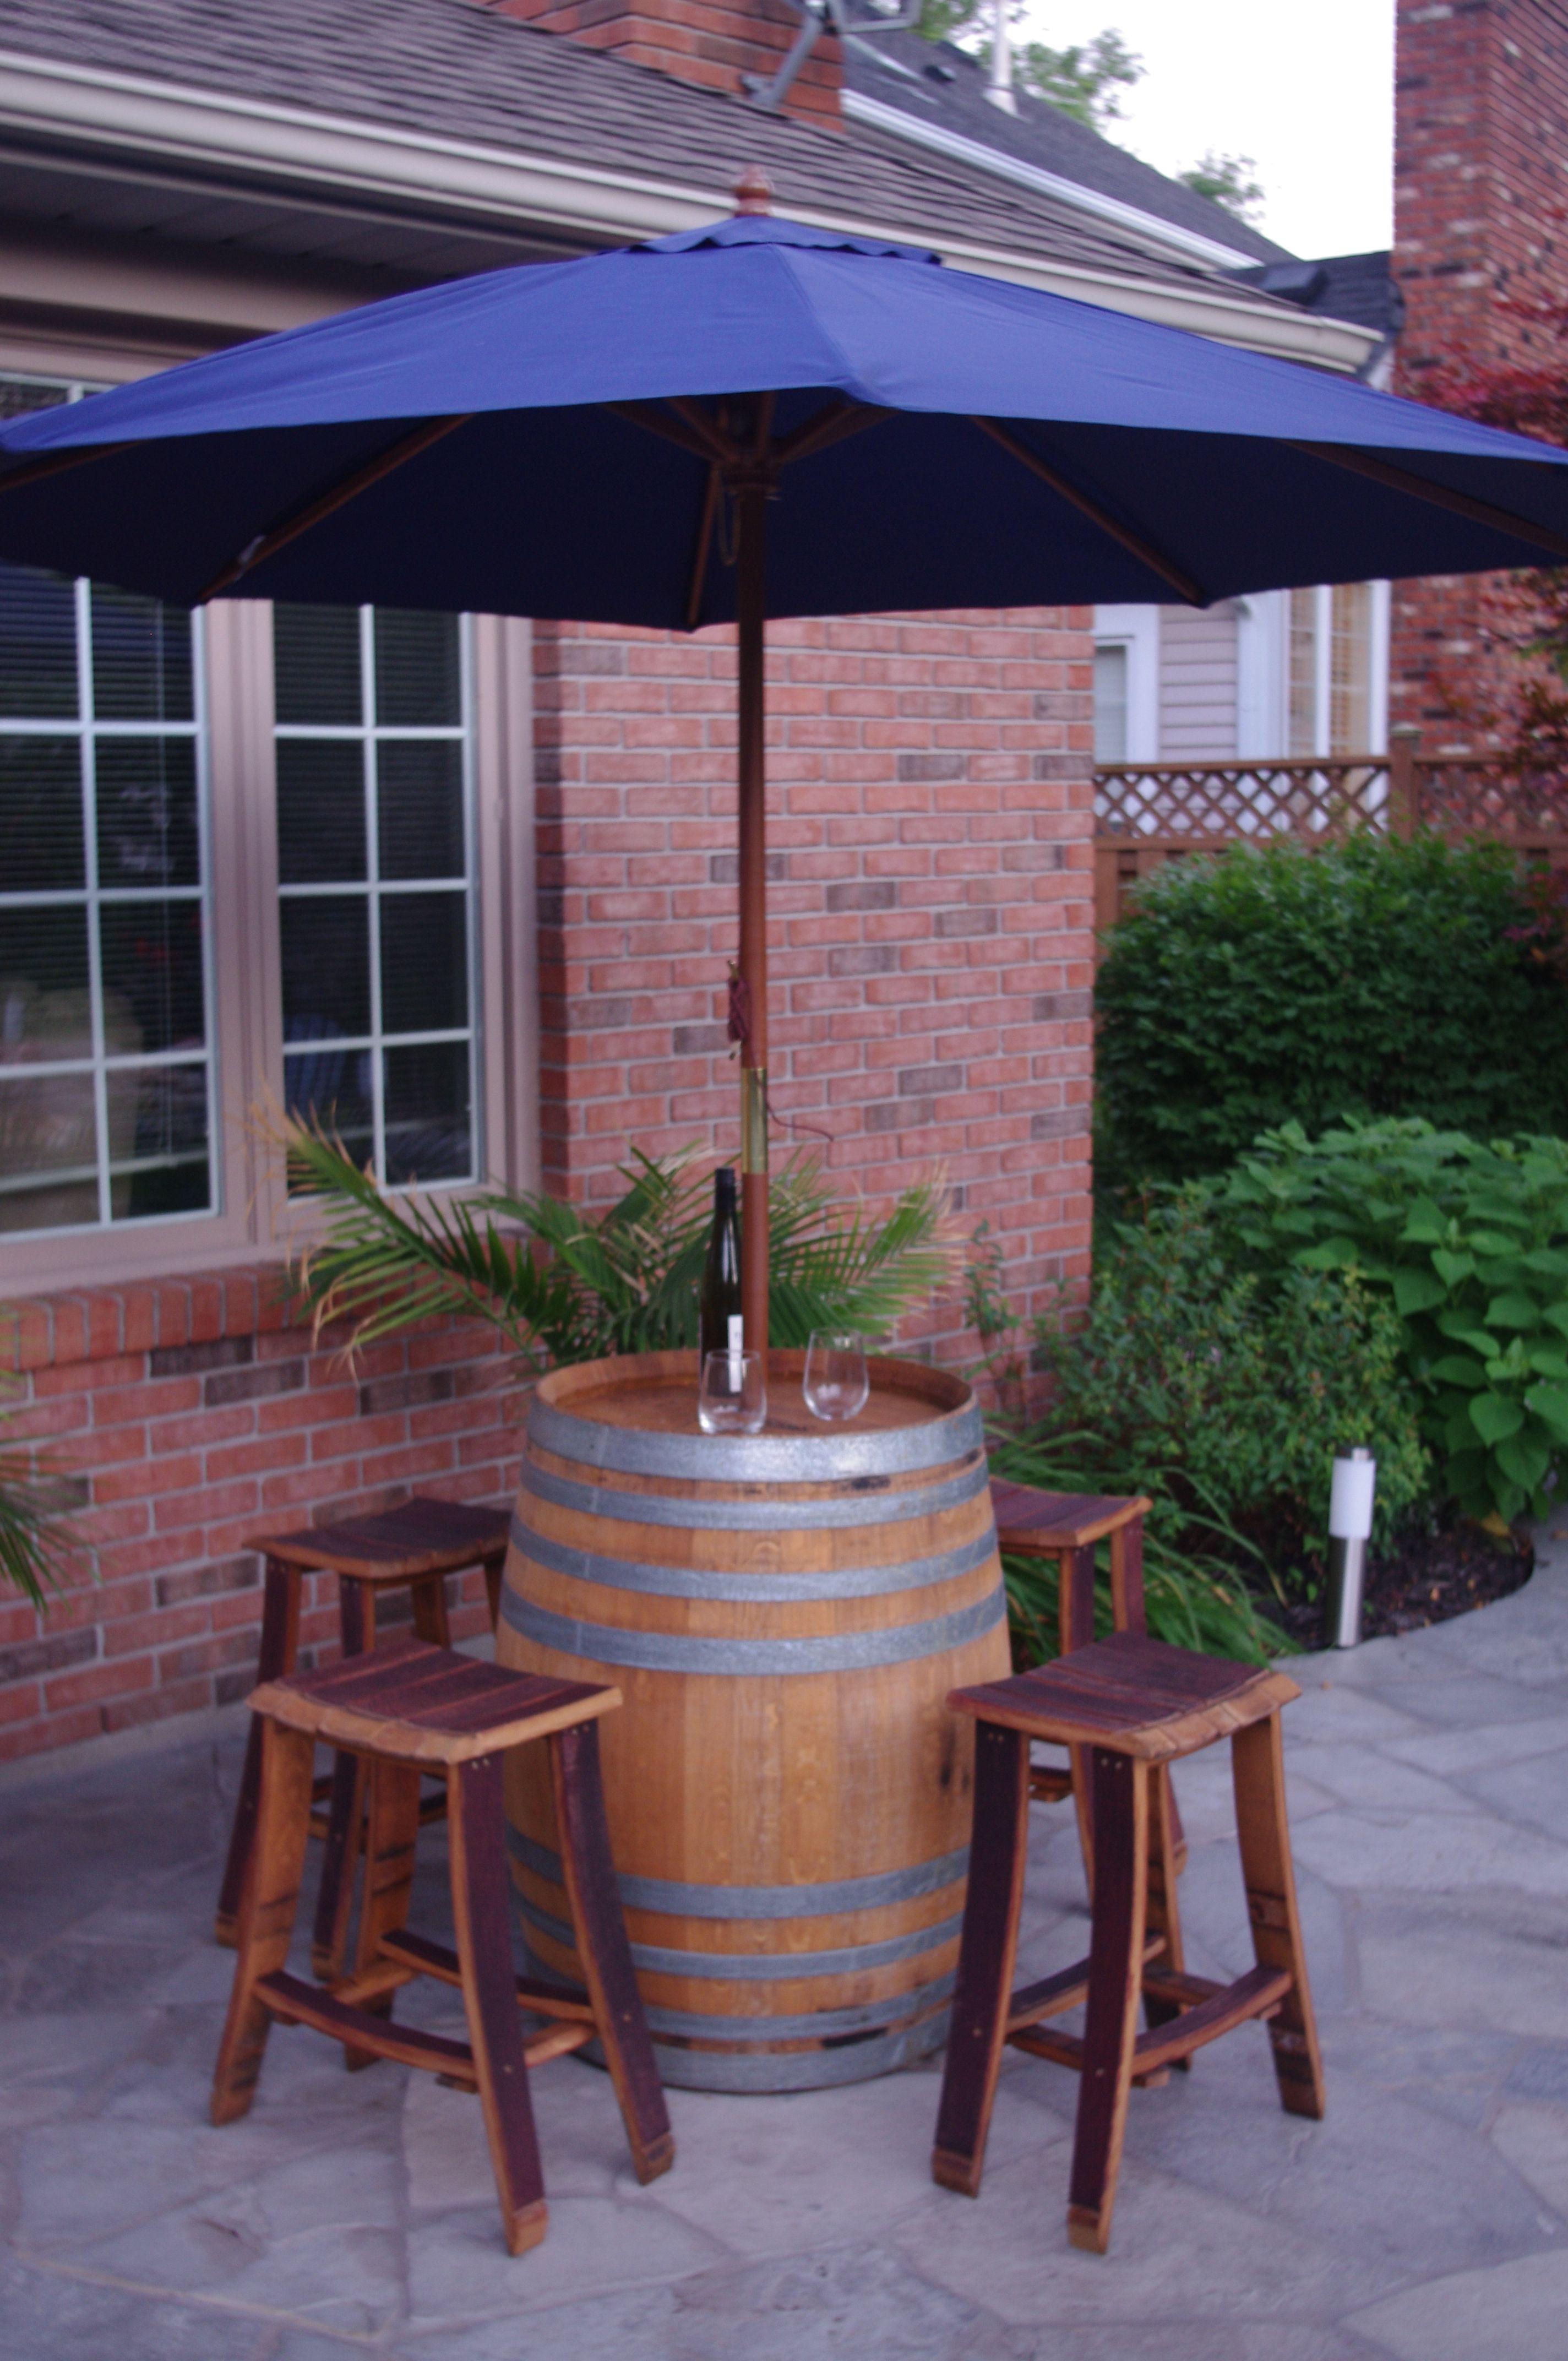 Wine Barrel Bar Table With Umbrella 4